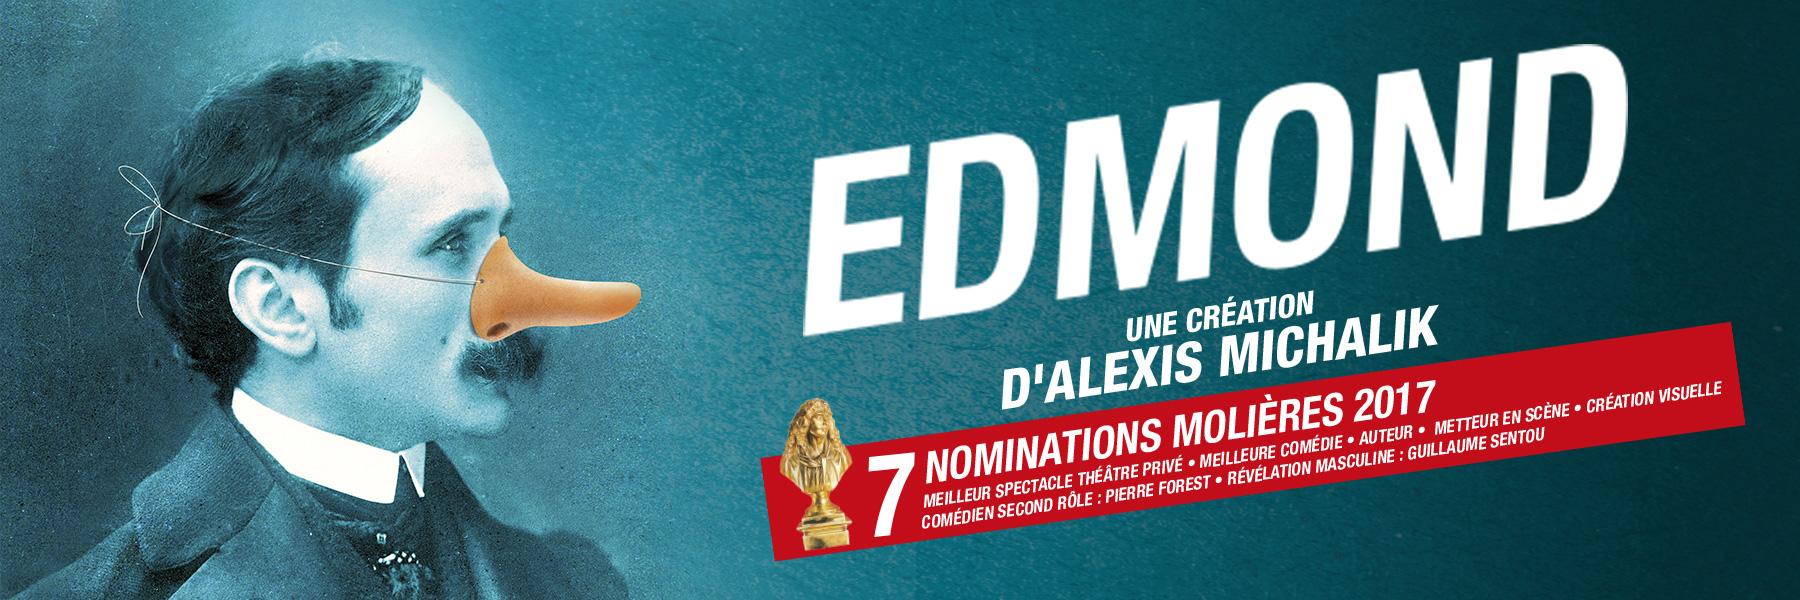 Edmond - Nominations Molières